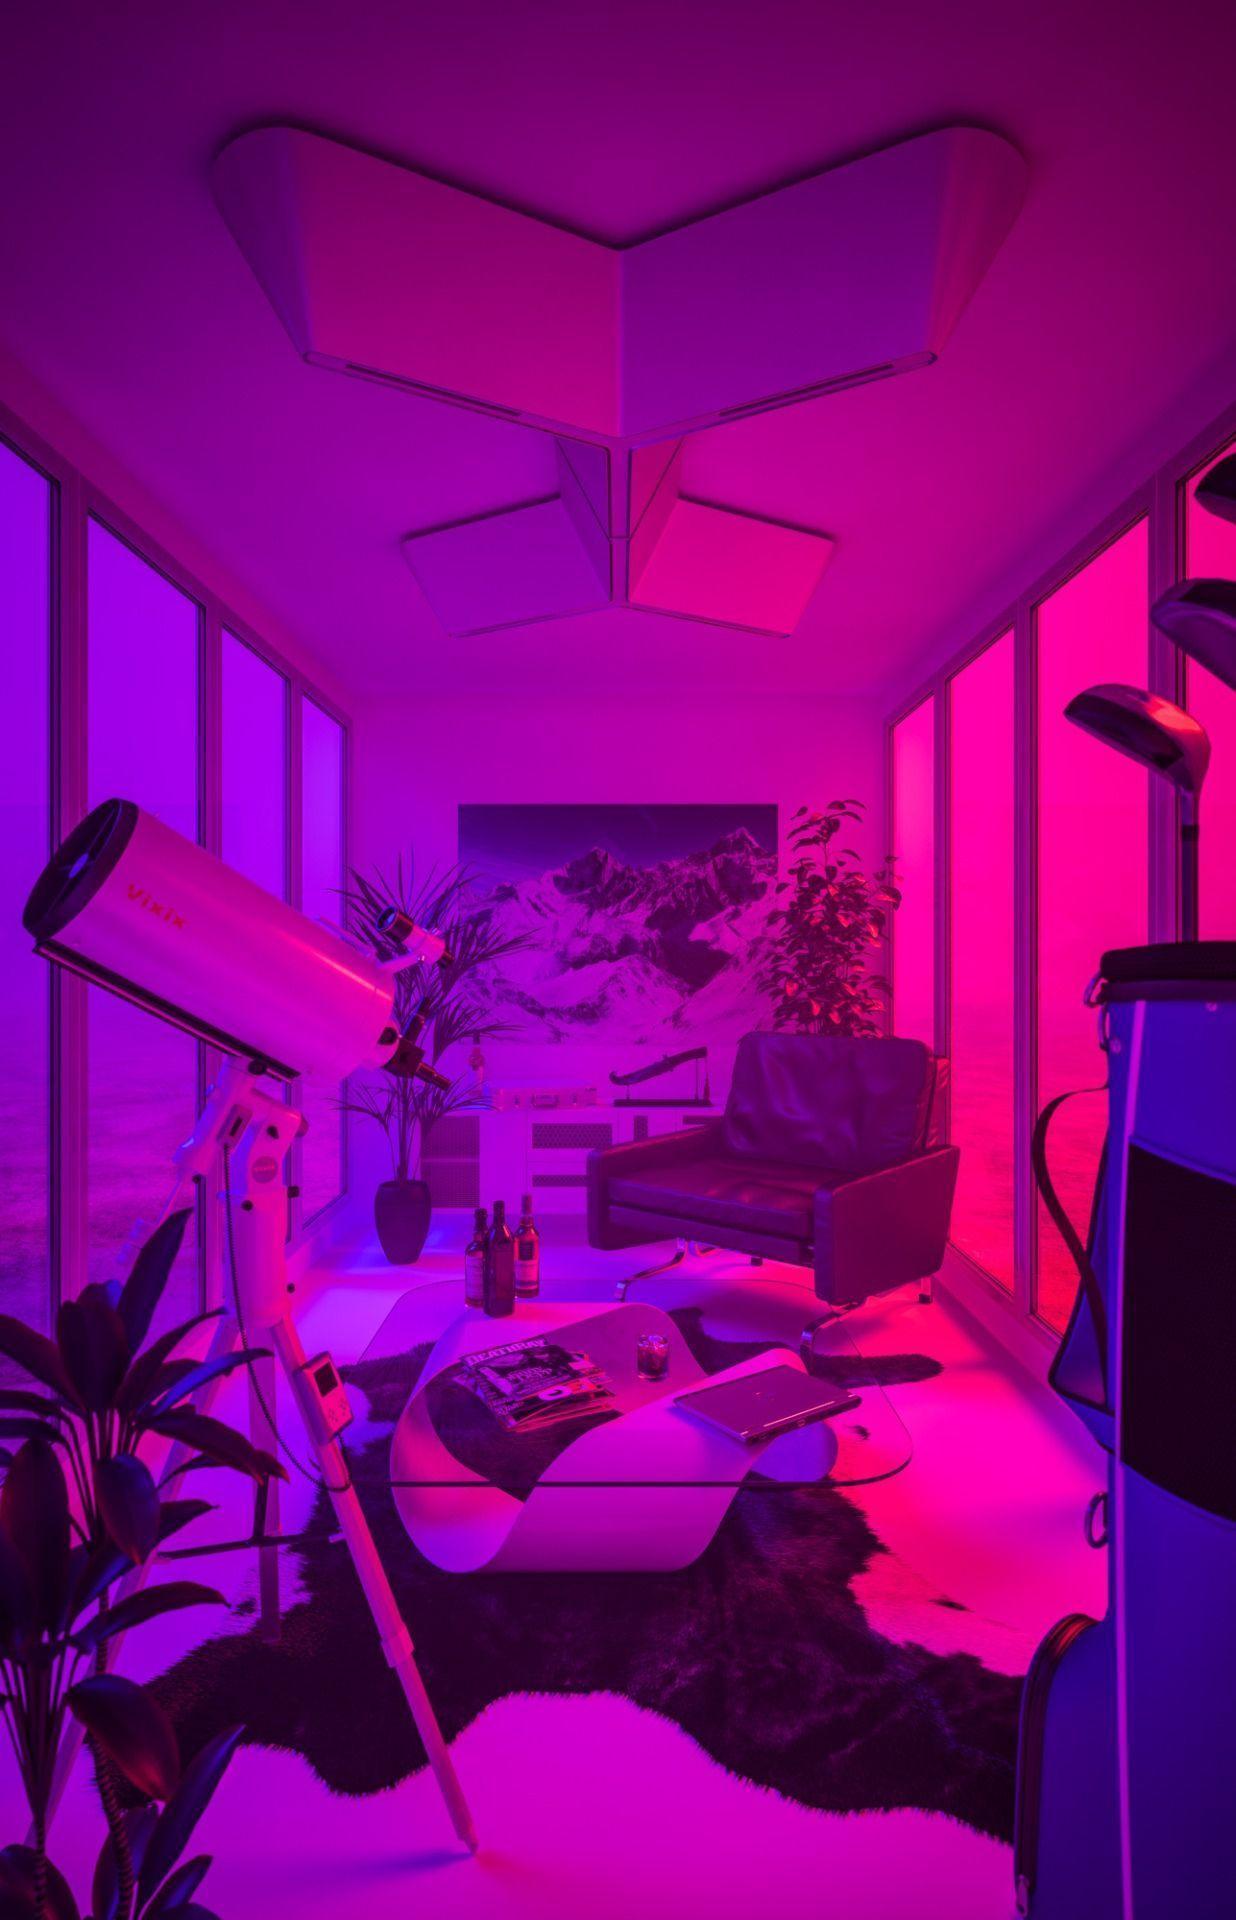 Purple Aesthetic Room Wallpapers - Top Free Purple ...